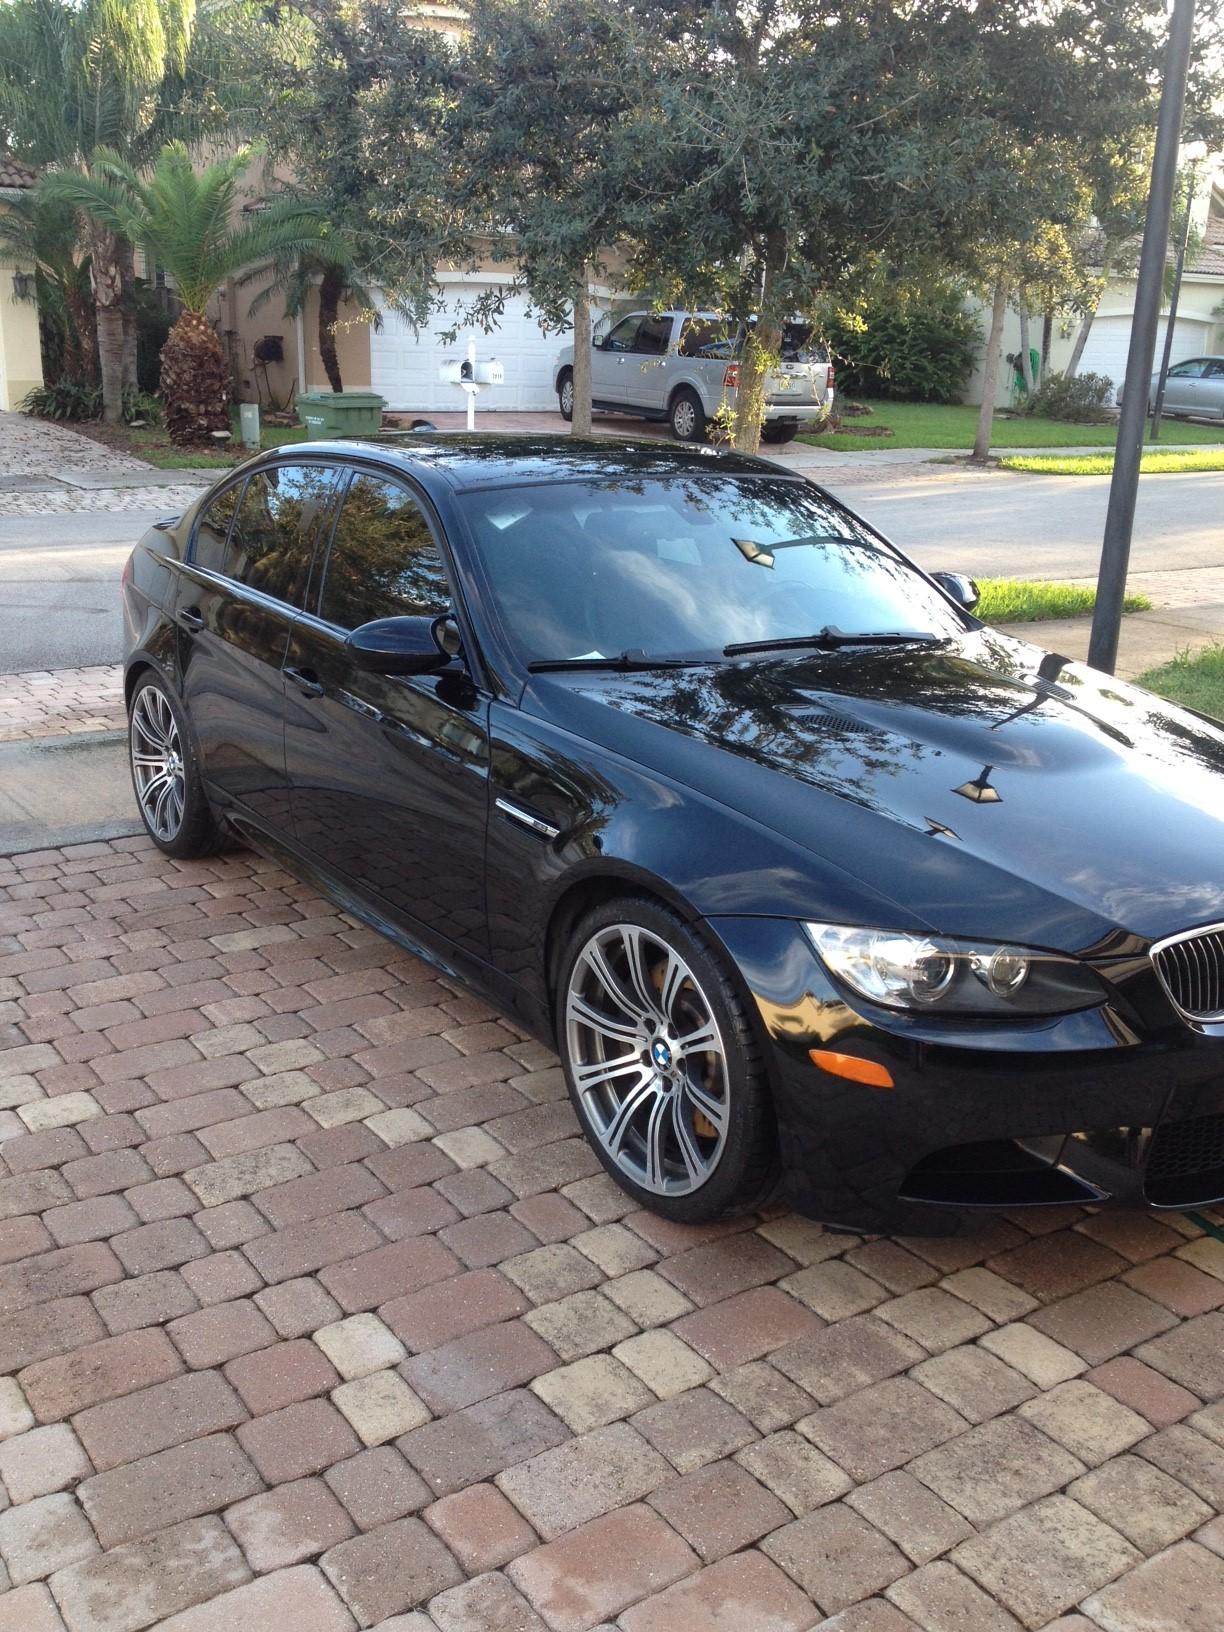 2008 Black M3 for Sale miles Extended Warranty till Dec 2017